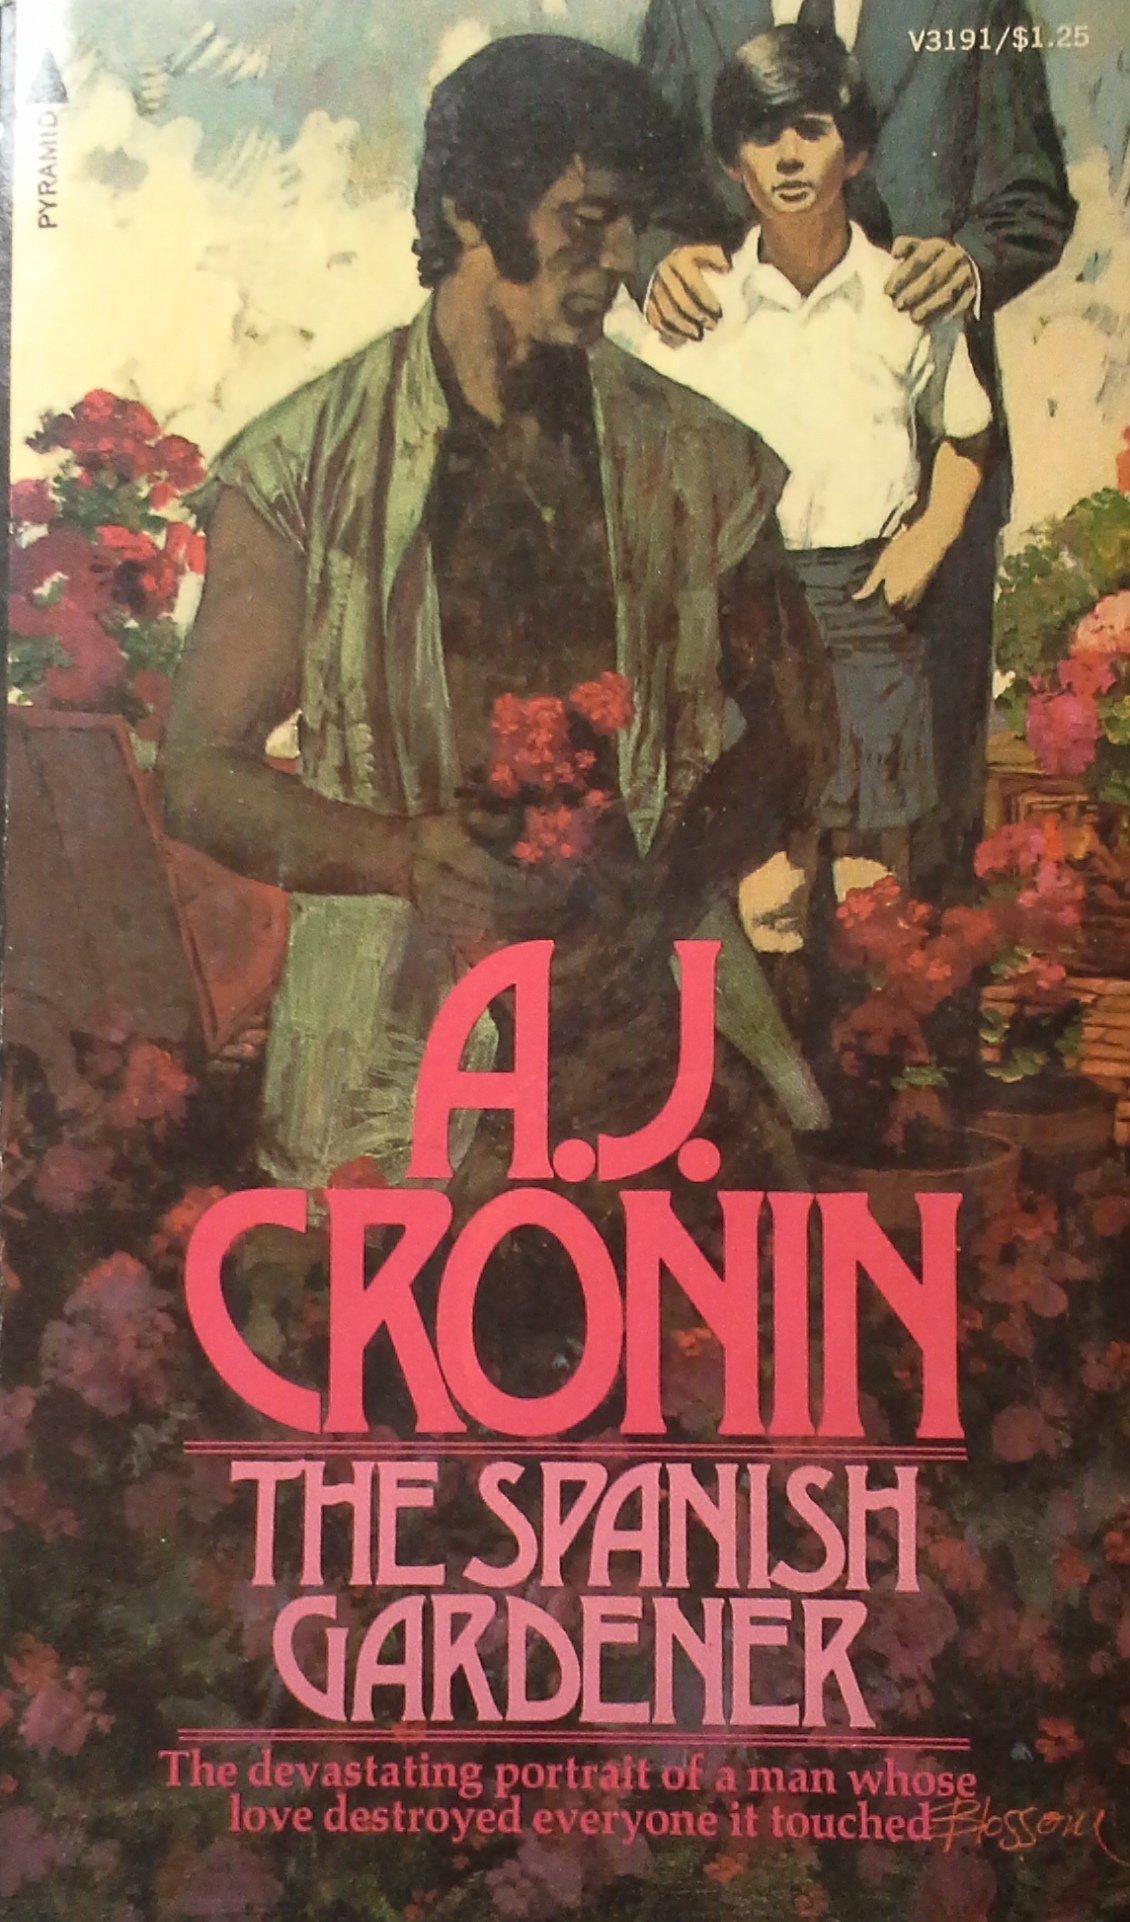 The Spanish Gardener: A.J. Cronin: 9780515031911: Amazon.com: Books